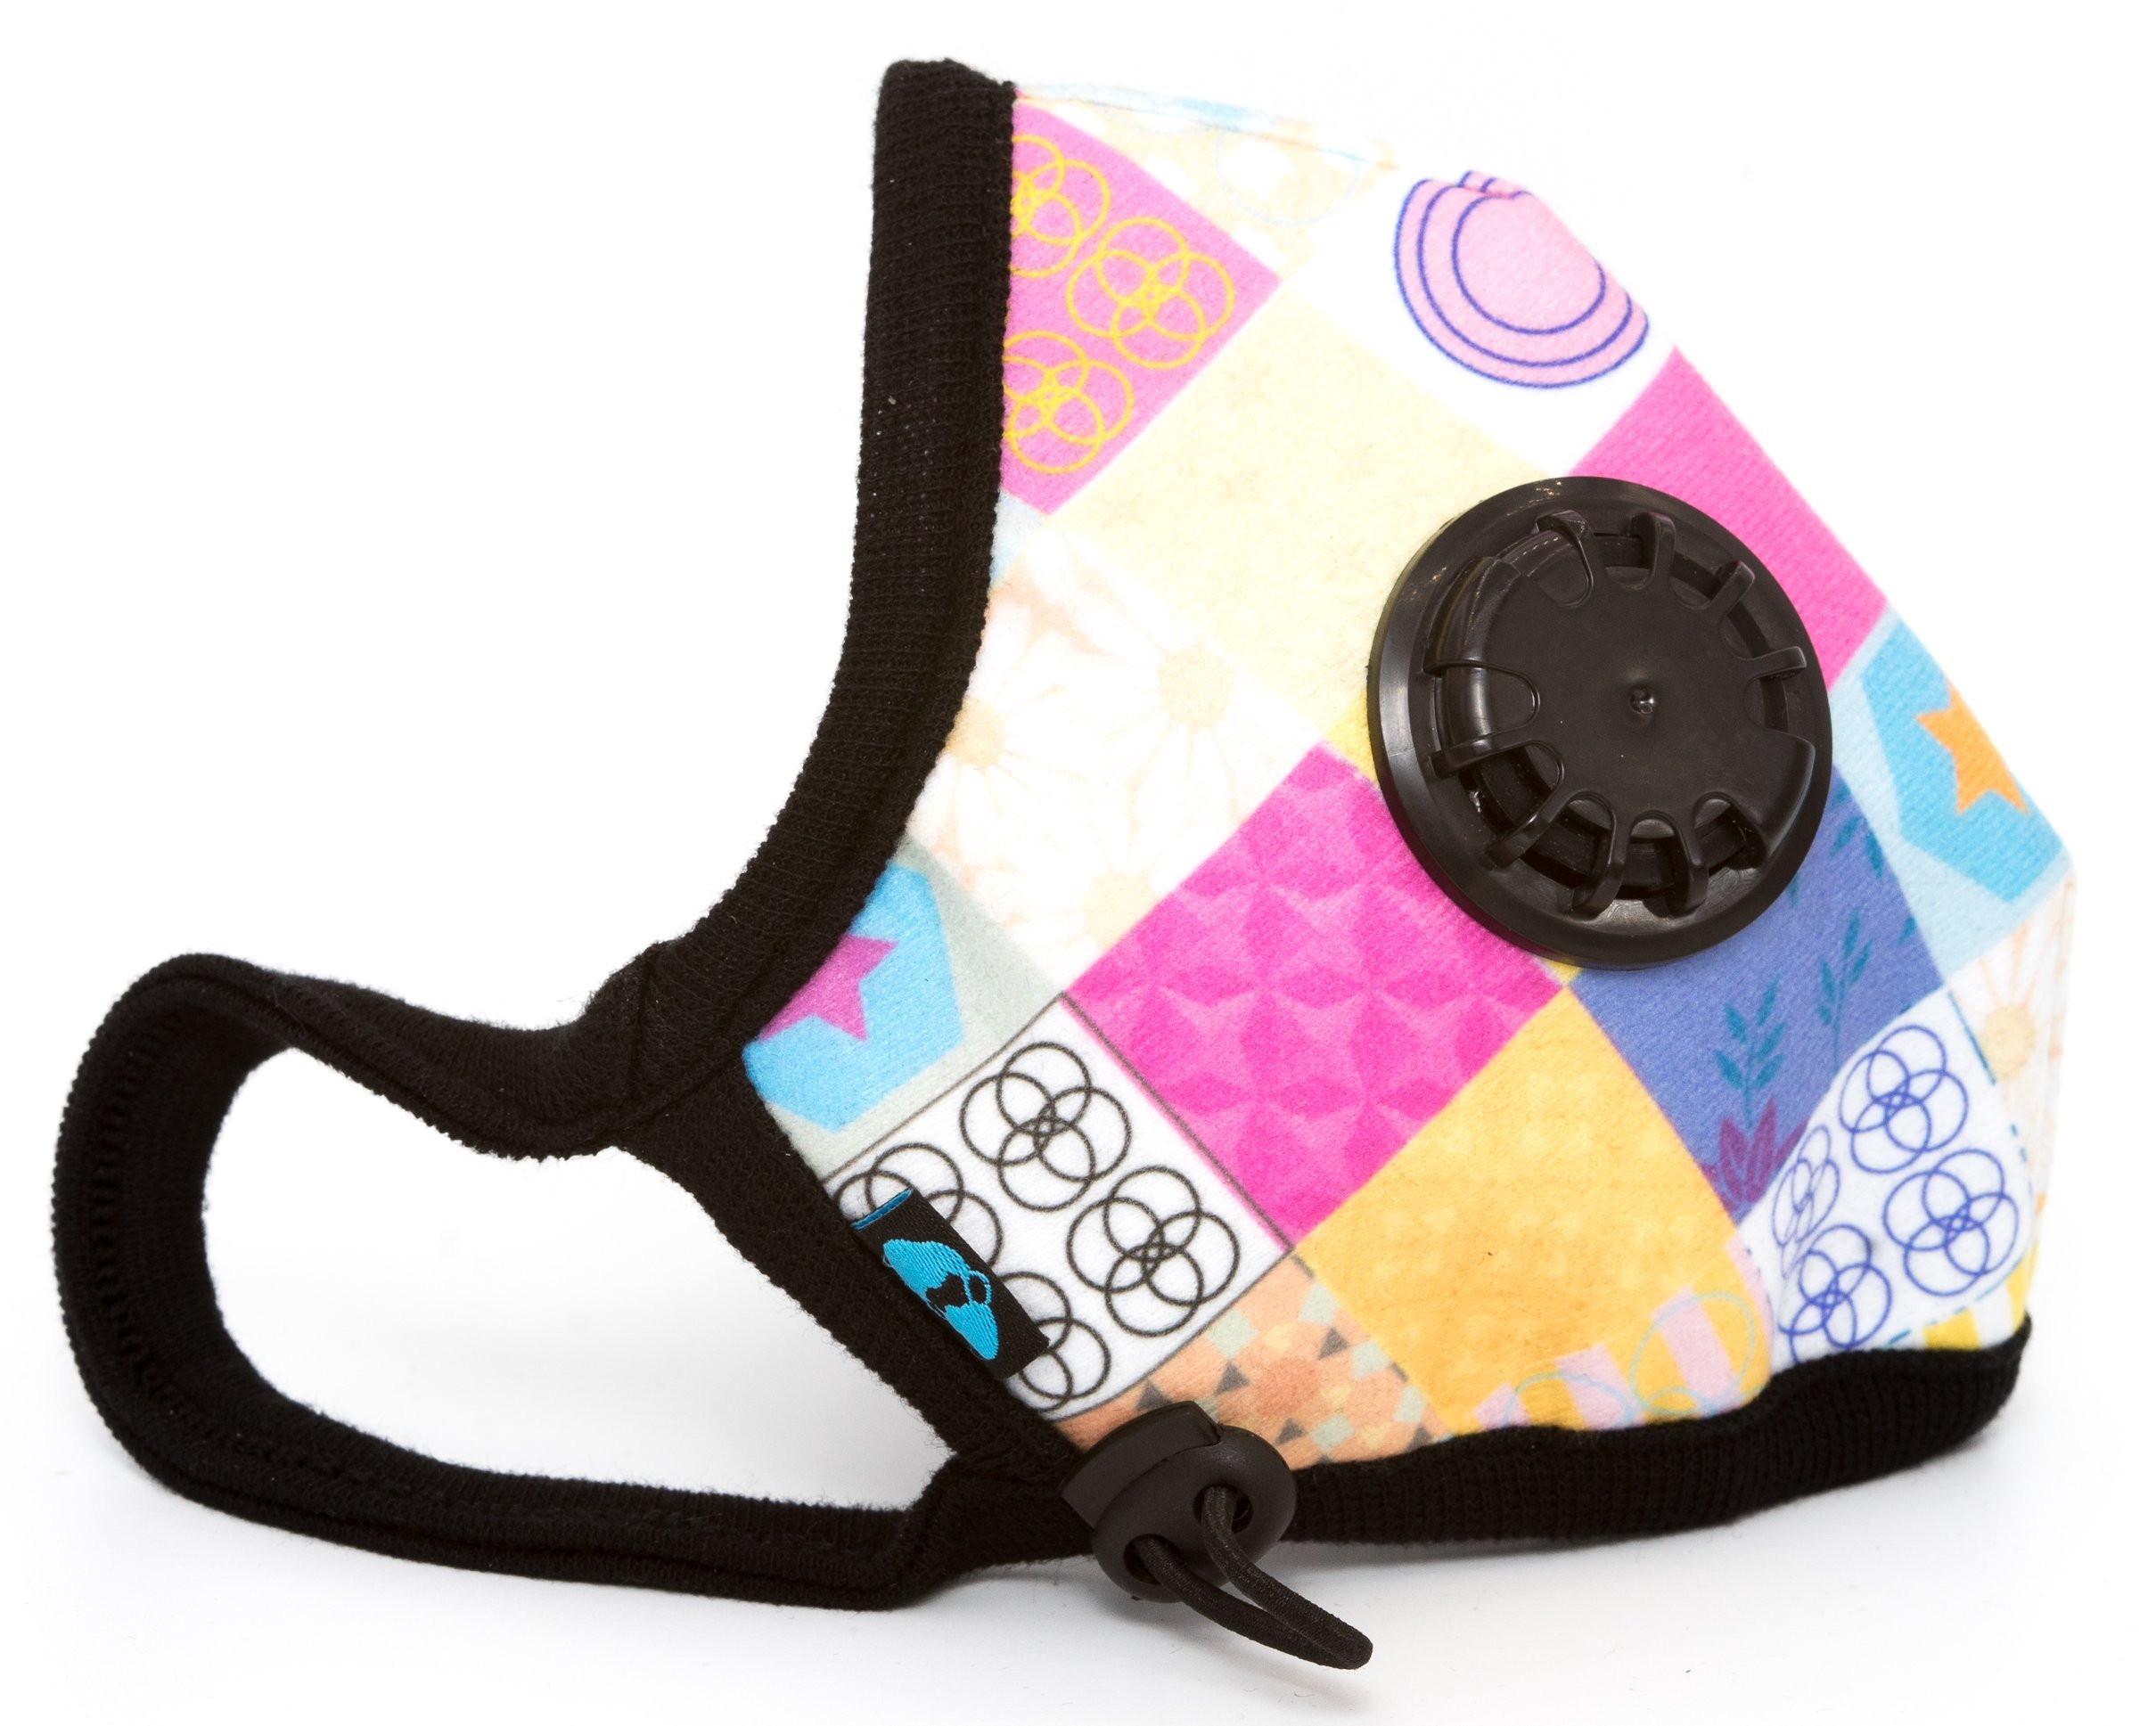 Cambridge Mask Co Pro Anti Pollution N99 Washable Military Grade Respirator with Adjustable Straps - Austen XL Pro